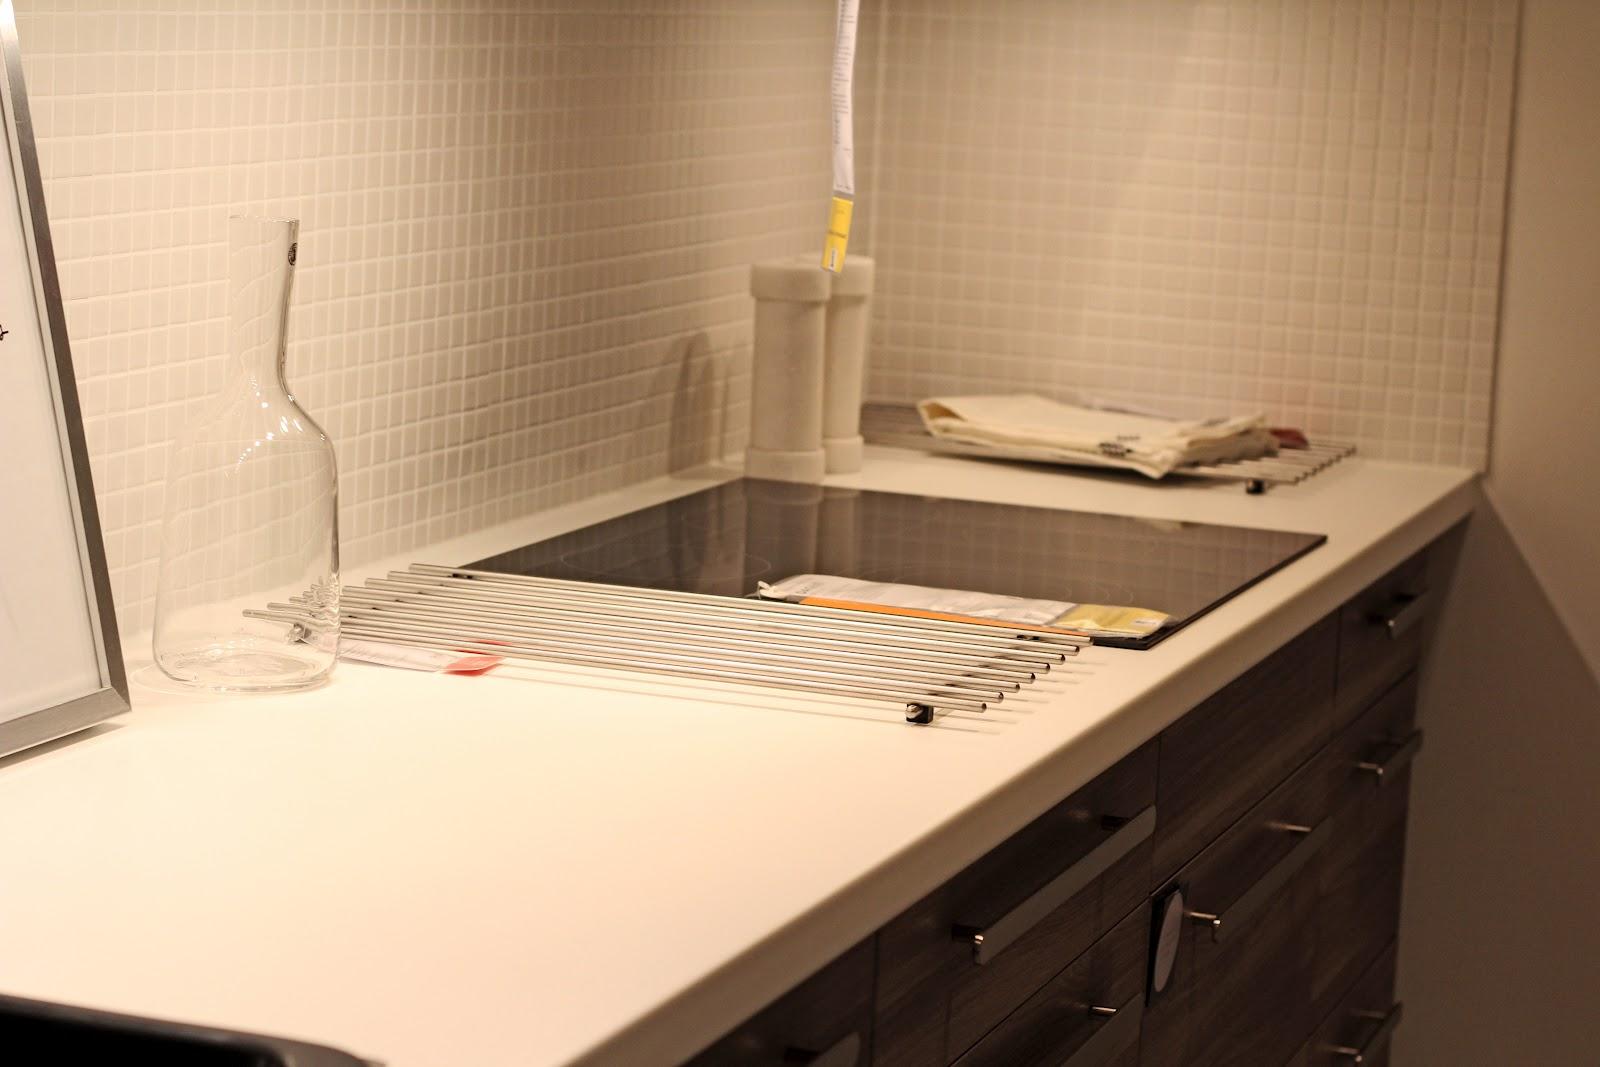 IKEA kjøkken